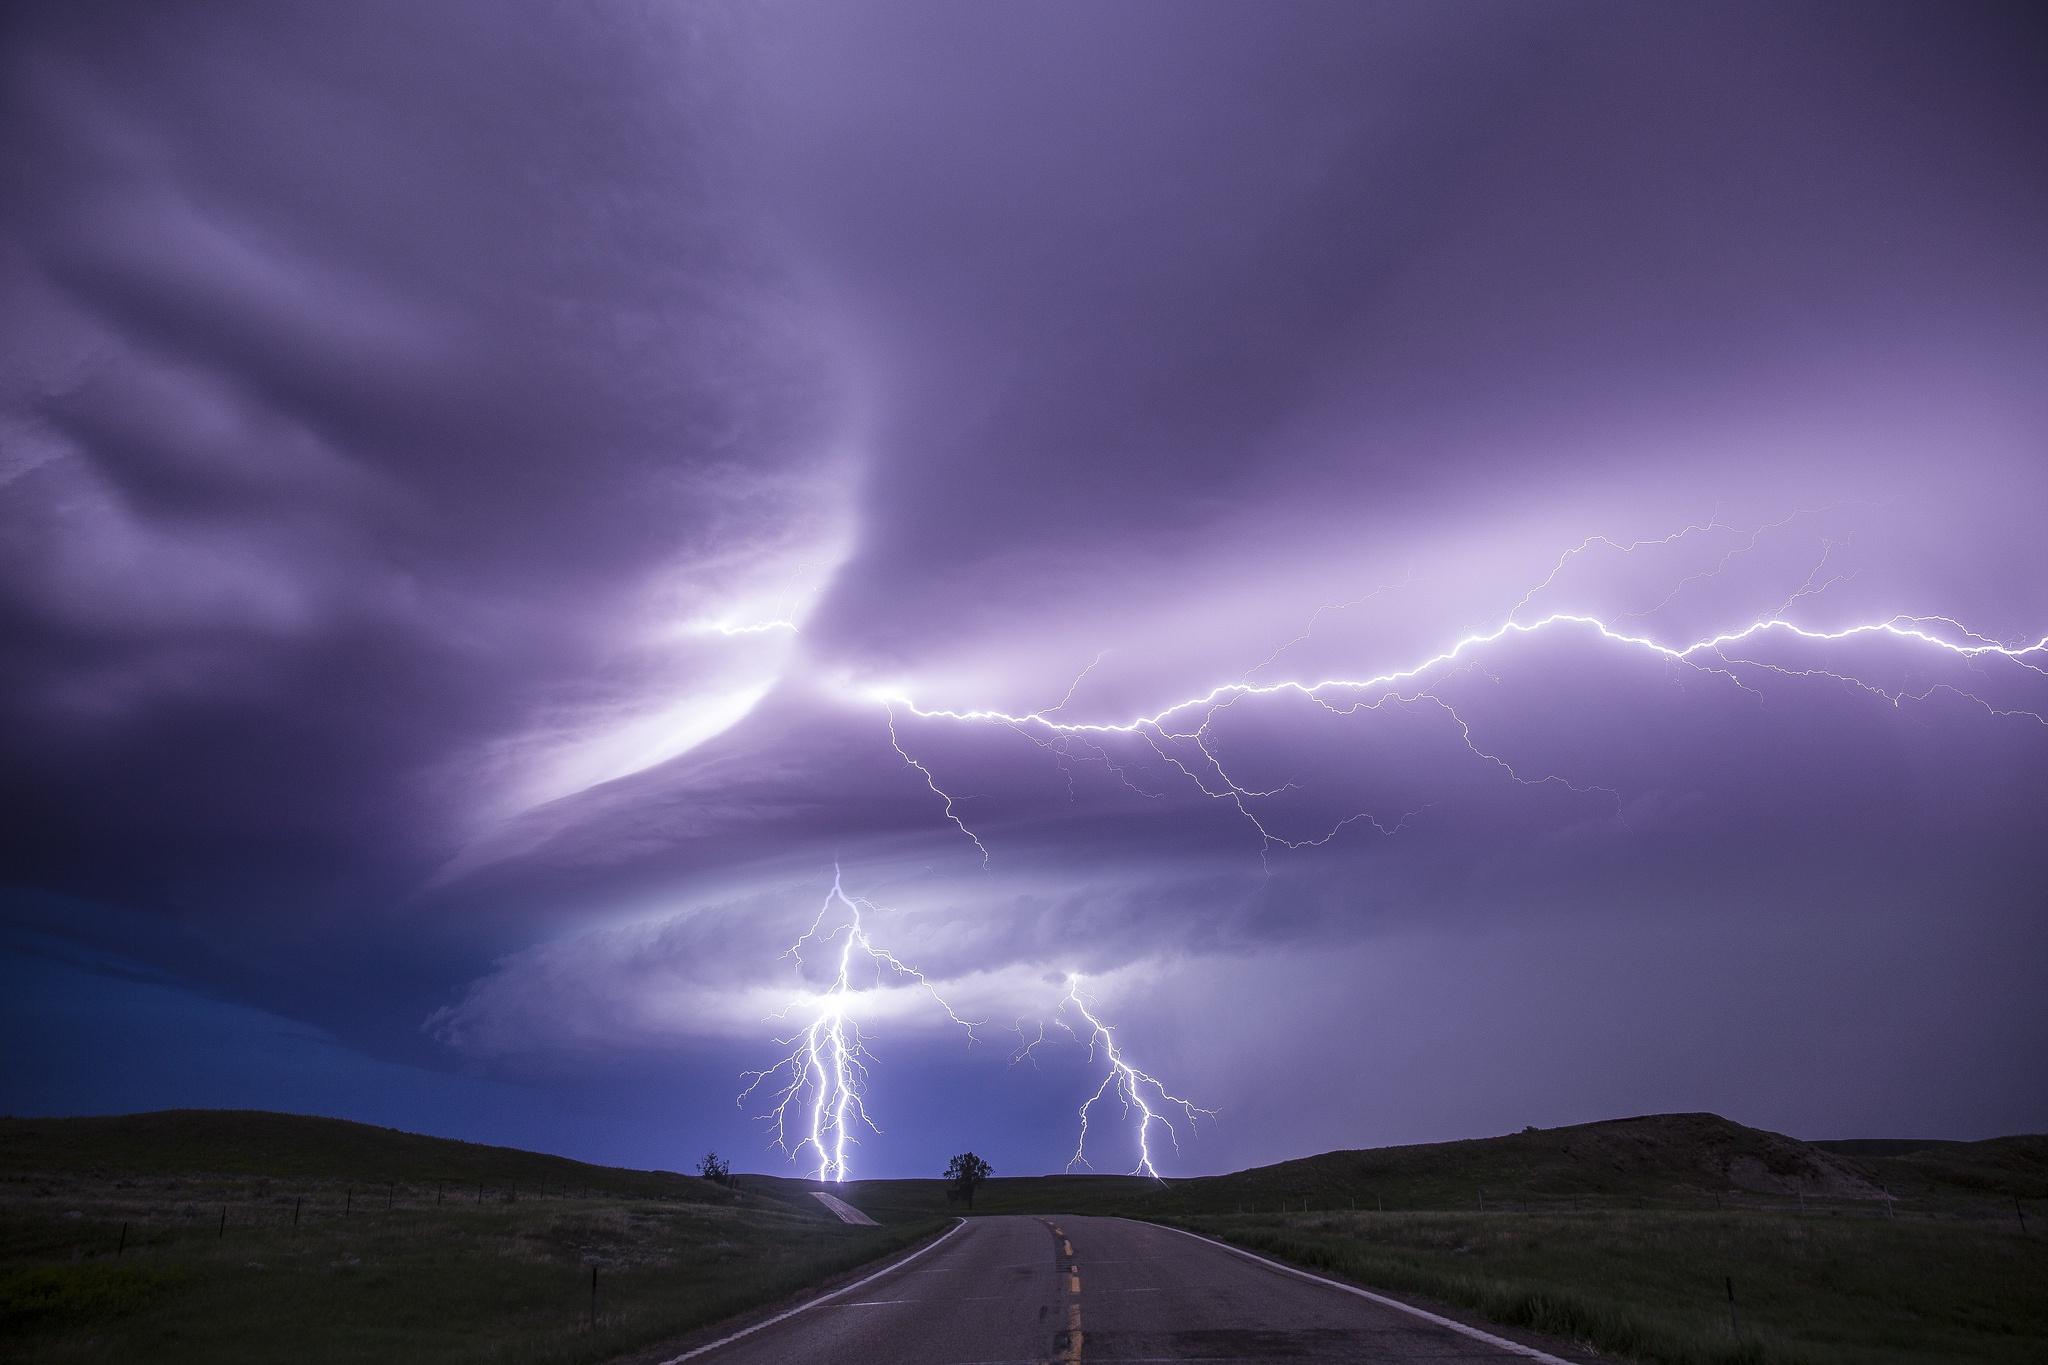 lightning hd wallpaper  background image  2048x1365  id